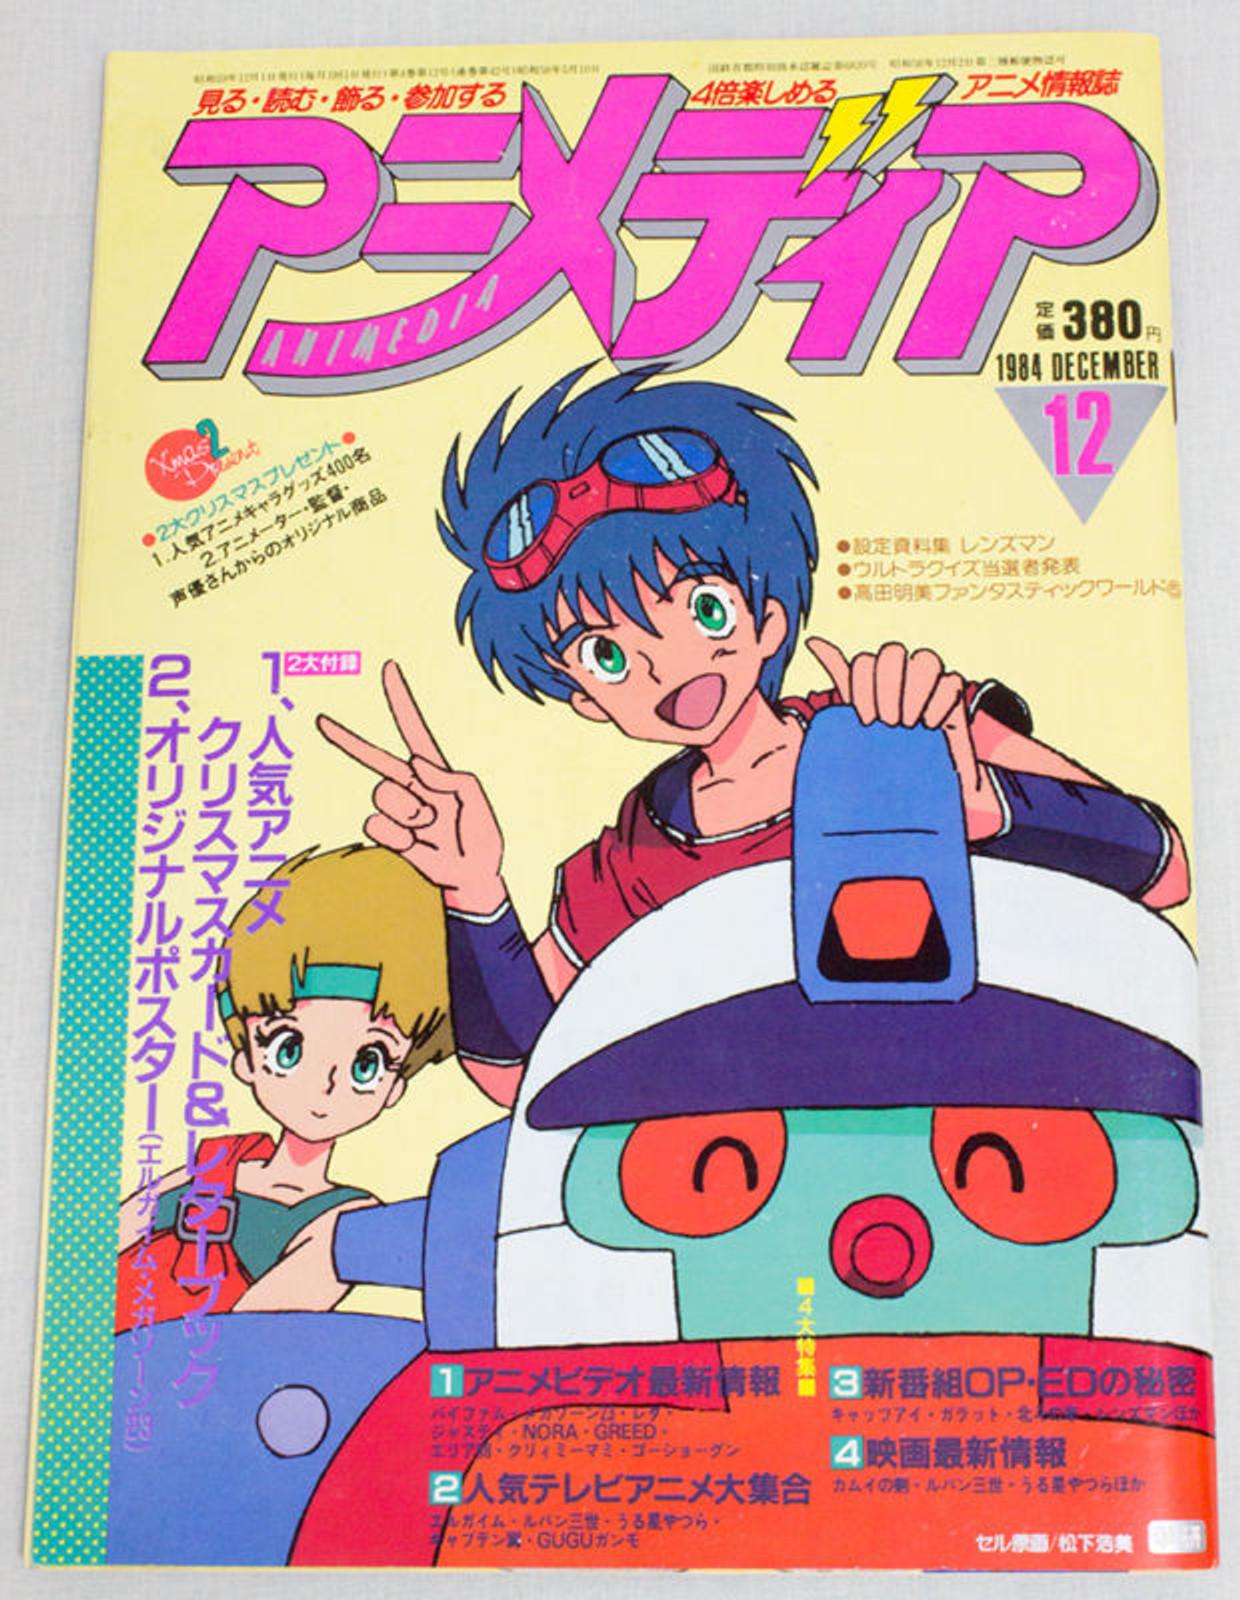 Animedia Japan Anime Magazine 12/1984 Vol.42 Gakken / VIFAM LENSMAN GALATT